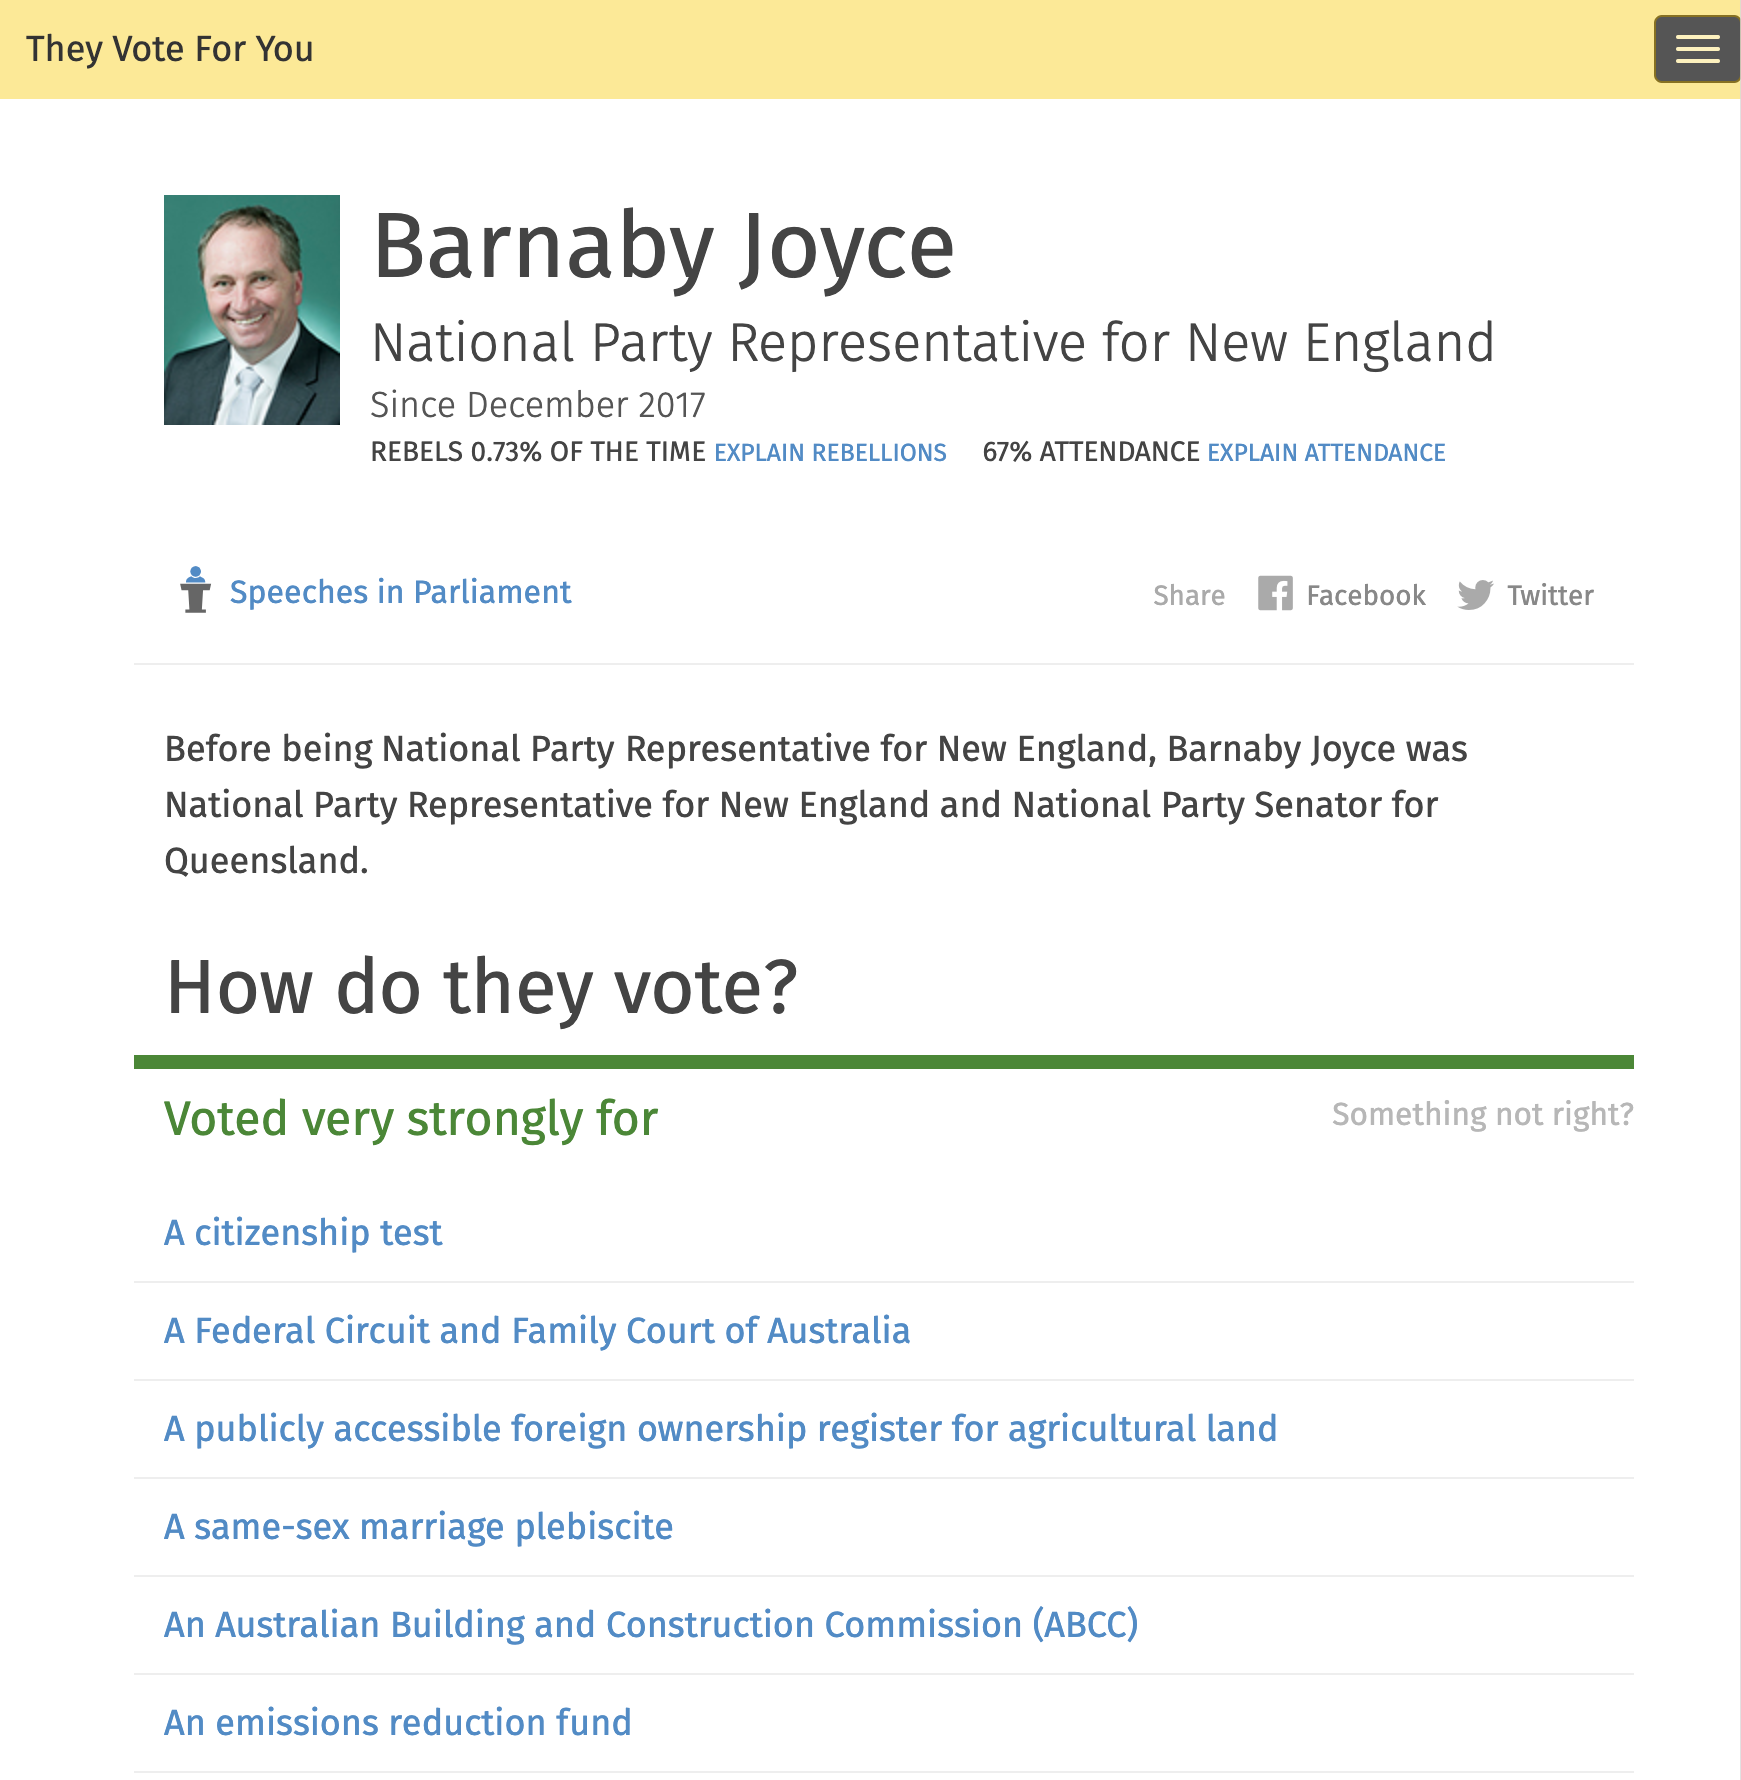 Barnaby Joyce's voting record